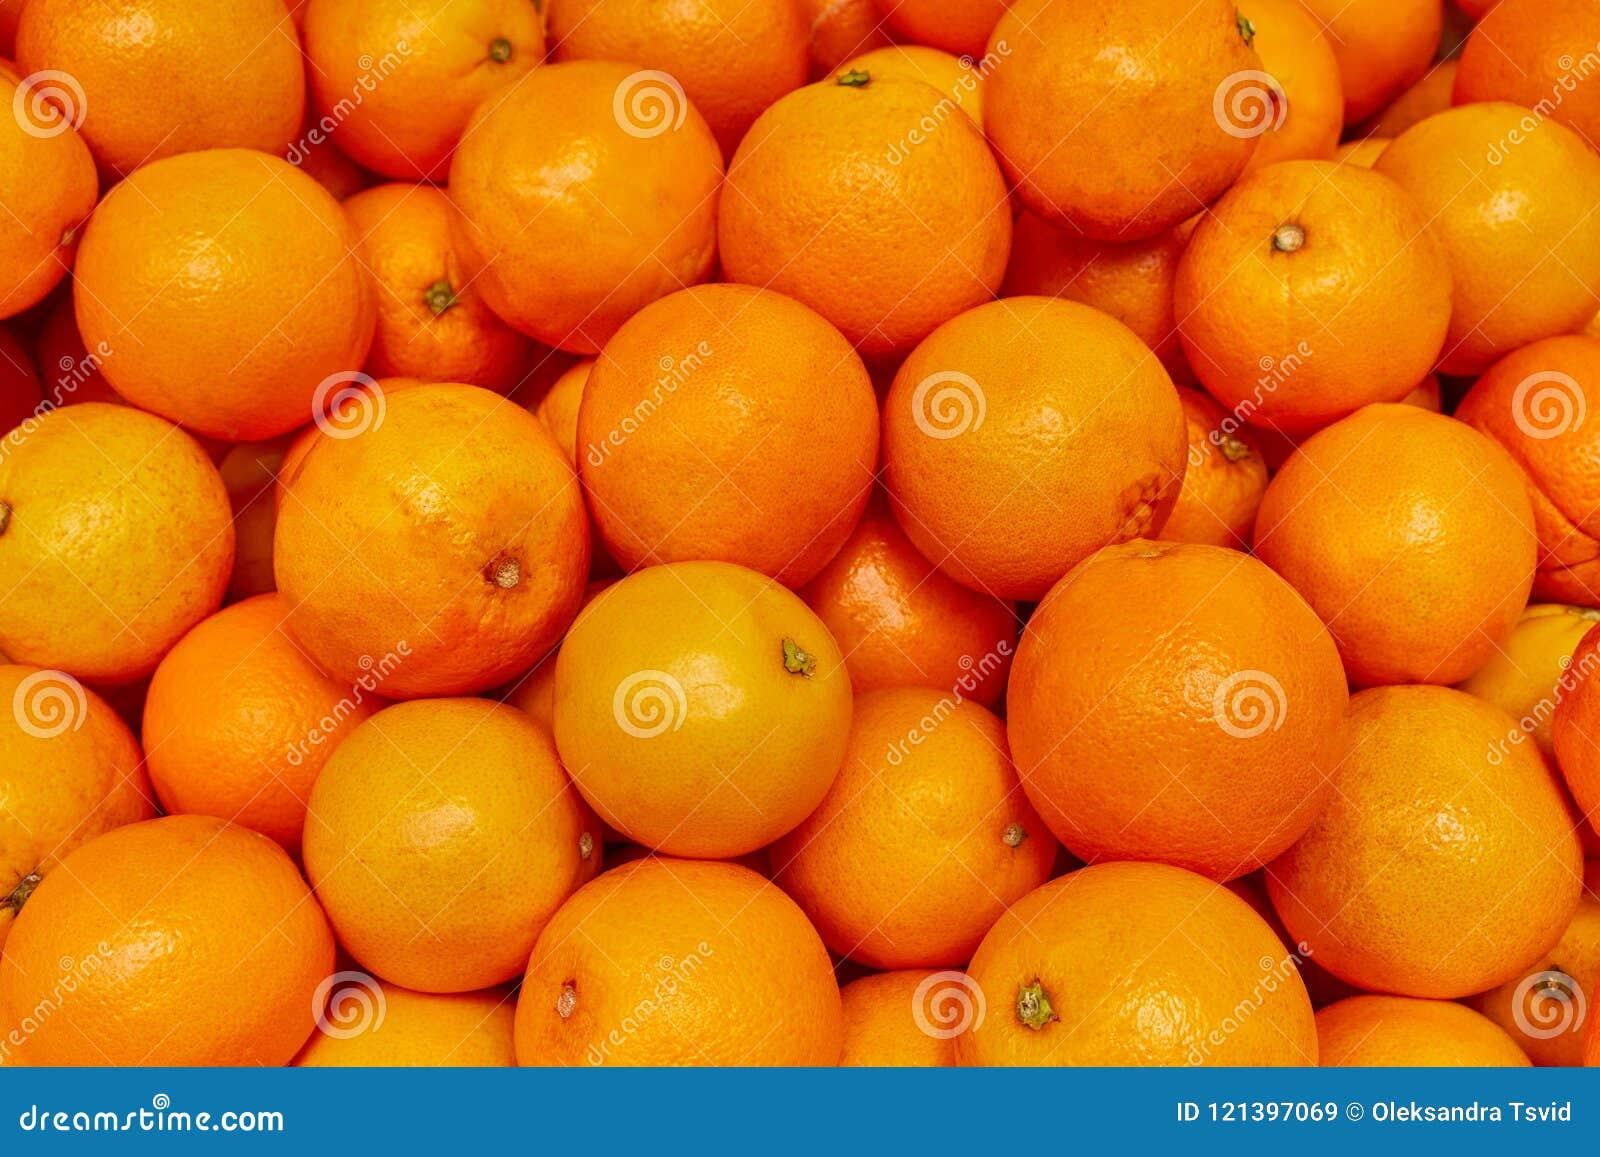 Fond orange, produit orange au marché